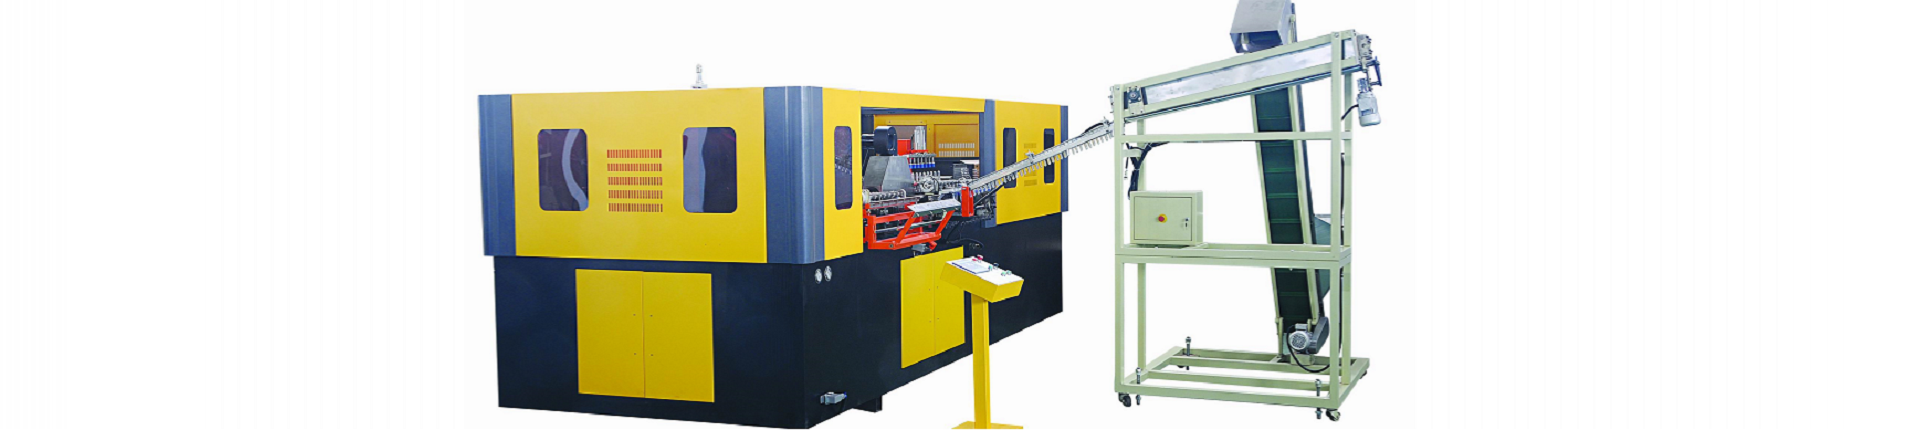 SFL-PET Series Pet Stretch Blow Molding Machine Image